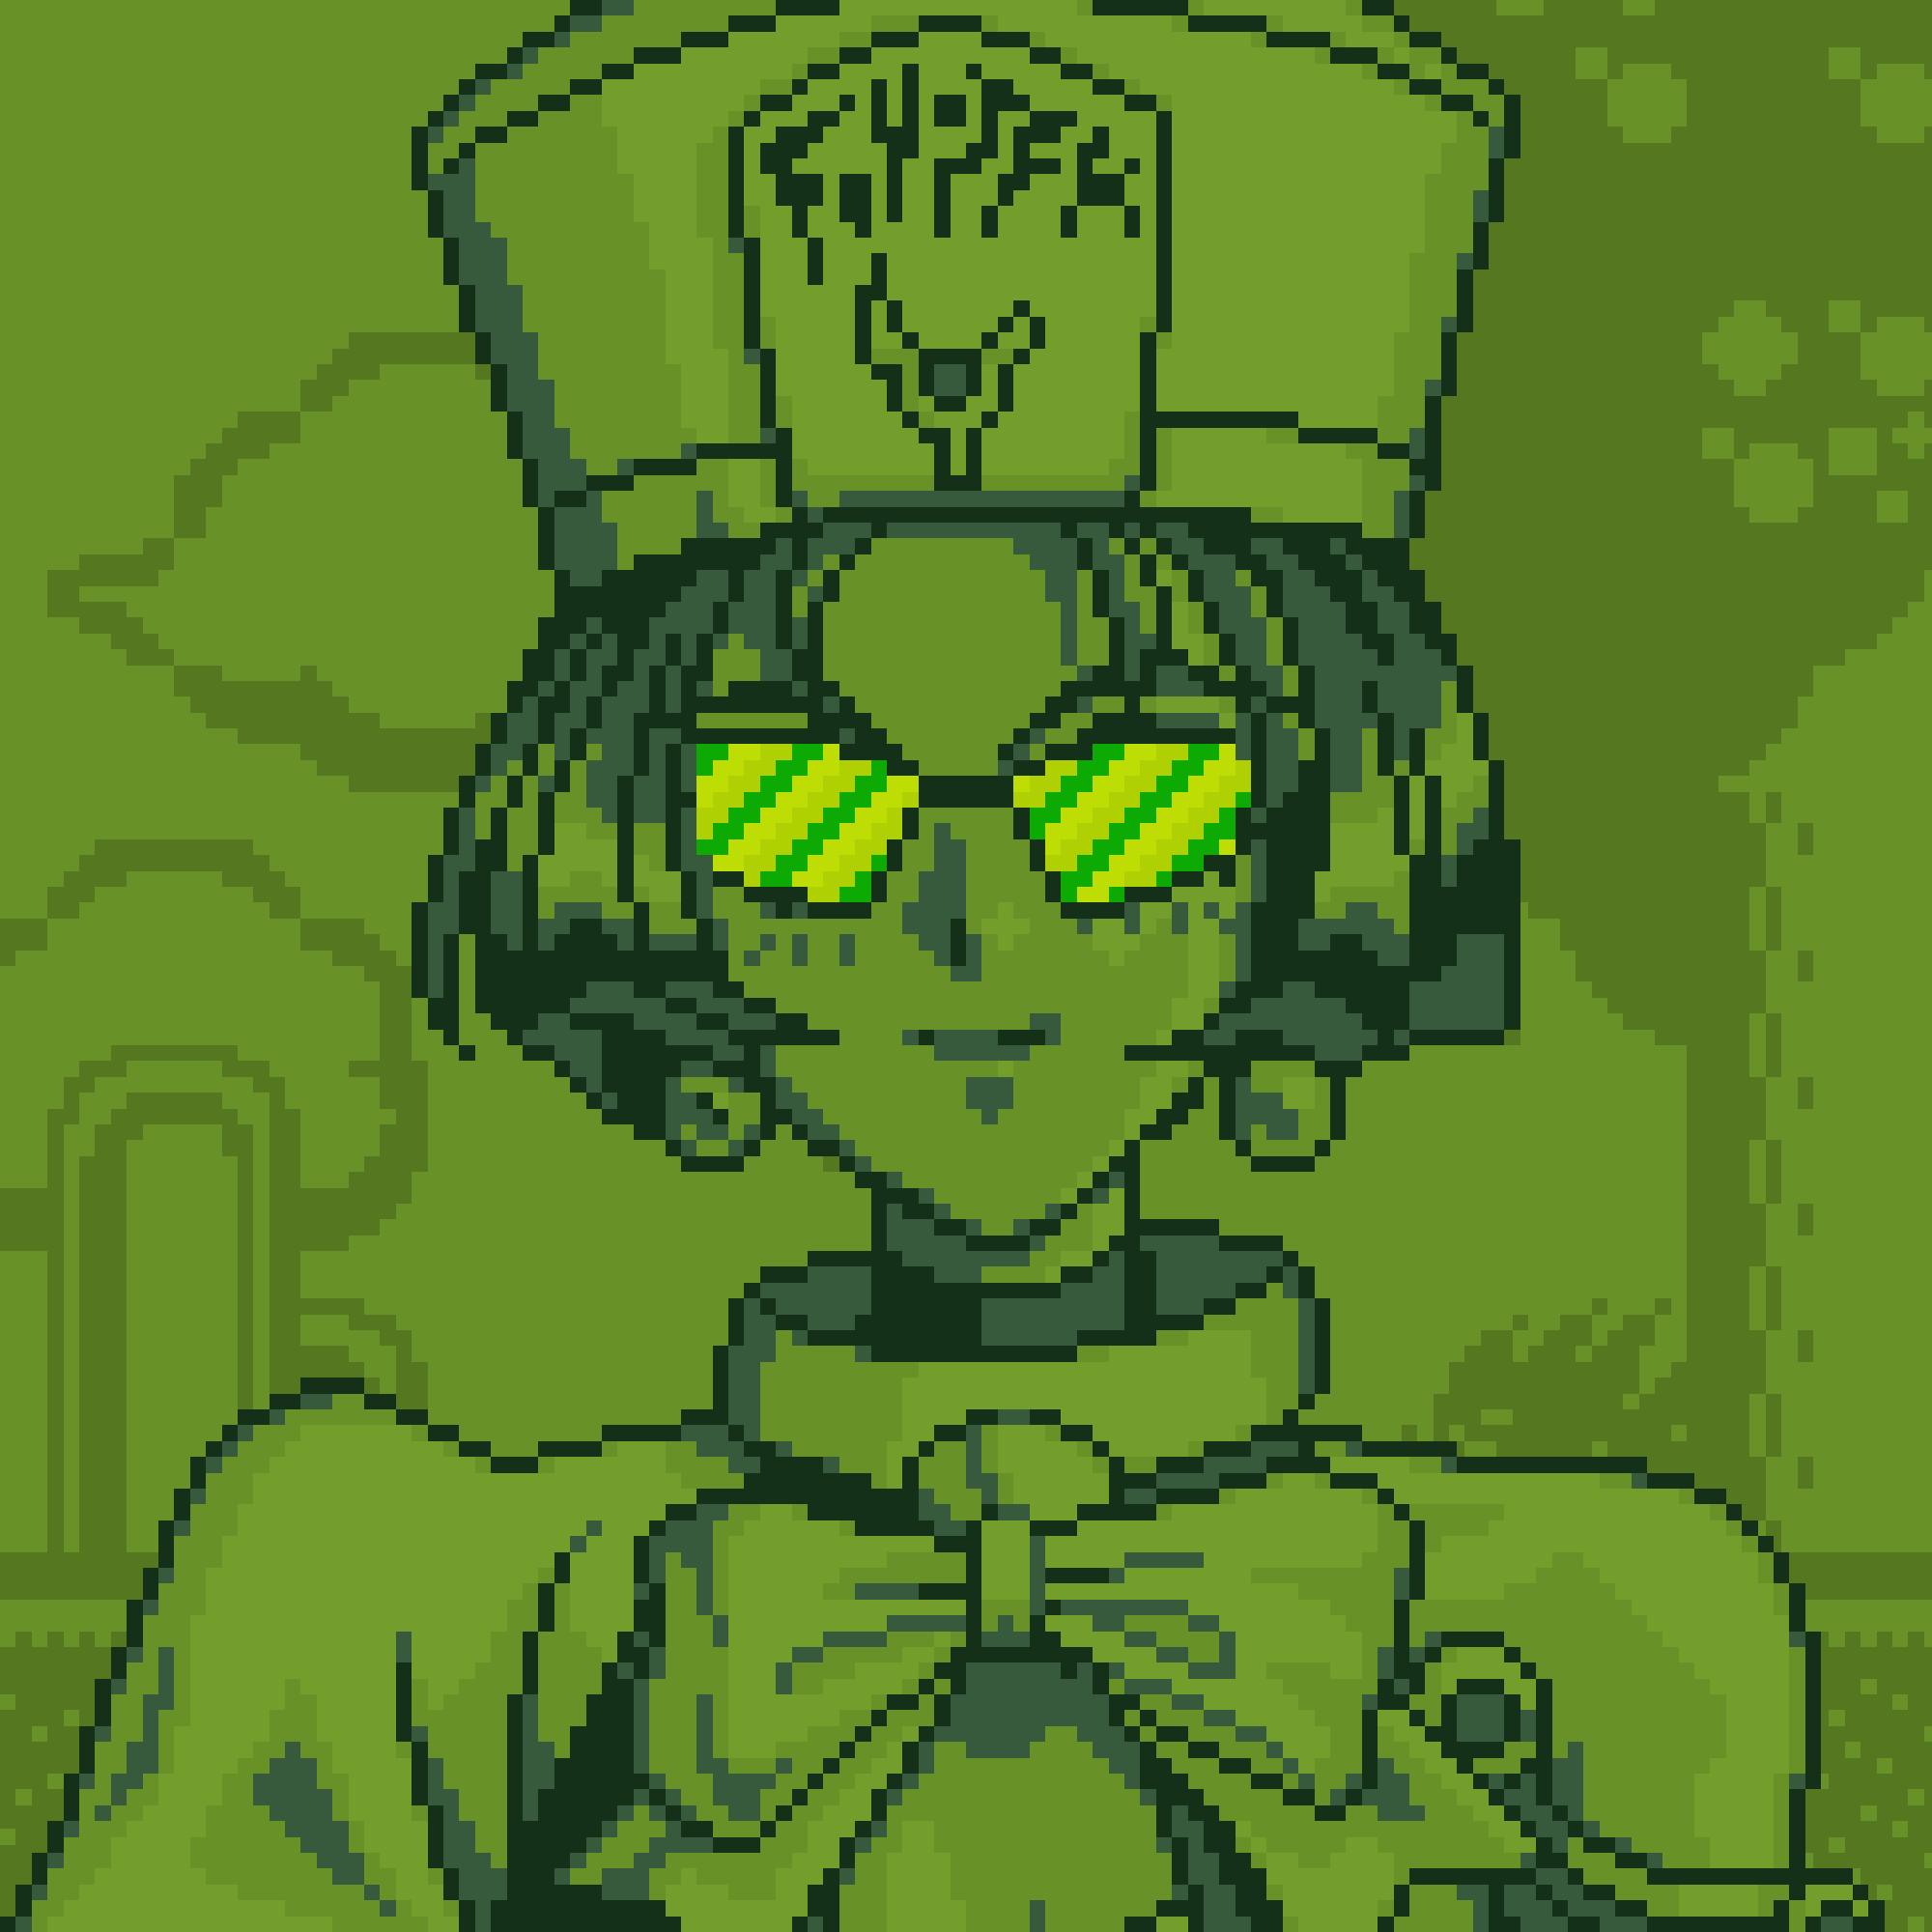 pixelart-meganekko-gameboy.png